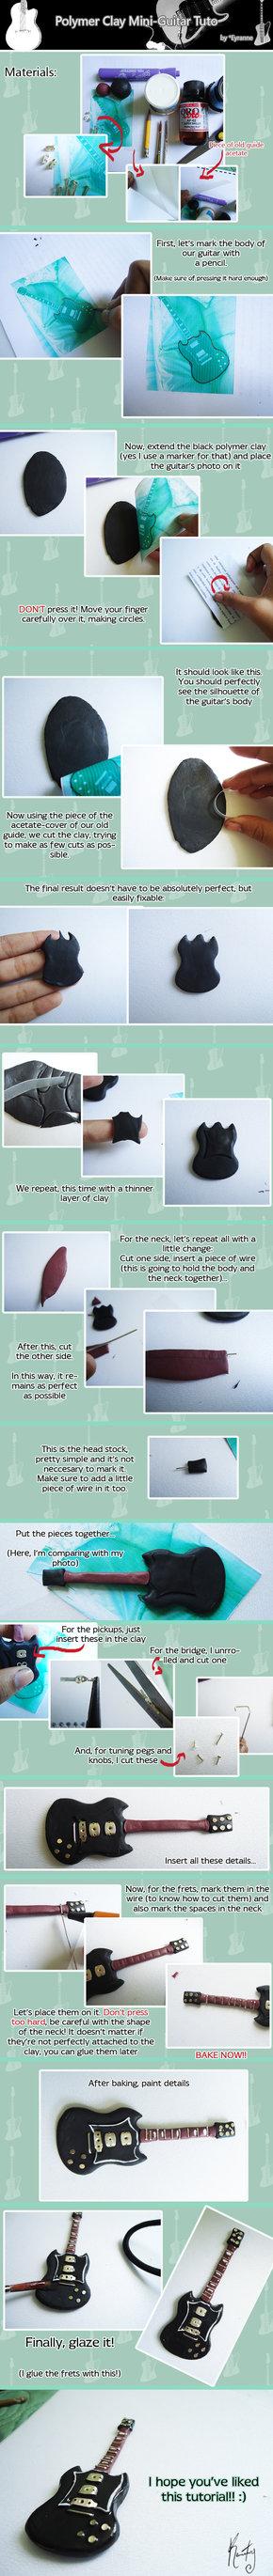 Polymer Clay Guitar Tuto by *Eyranne on deviantART